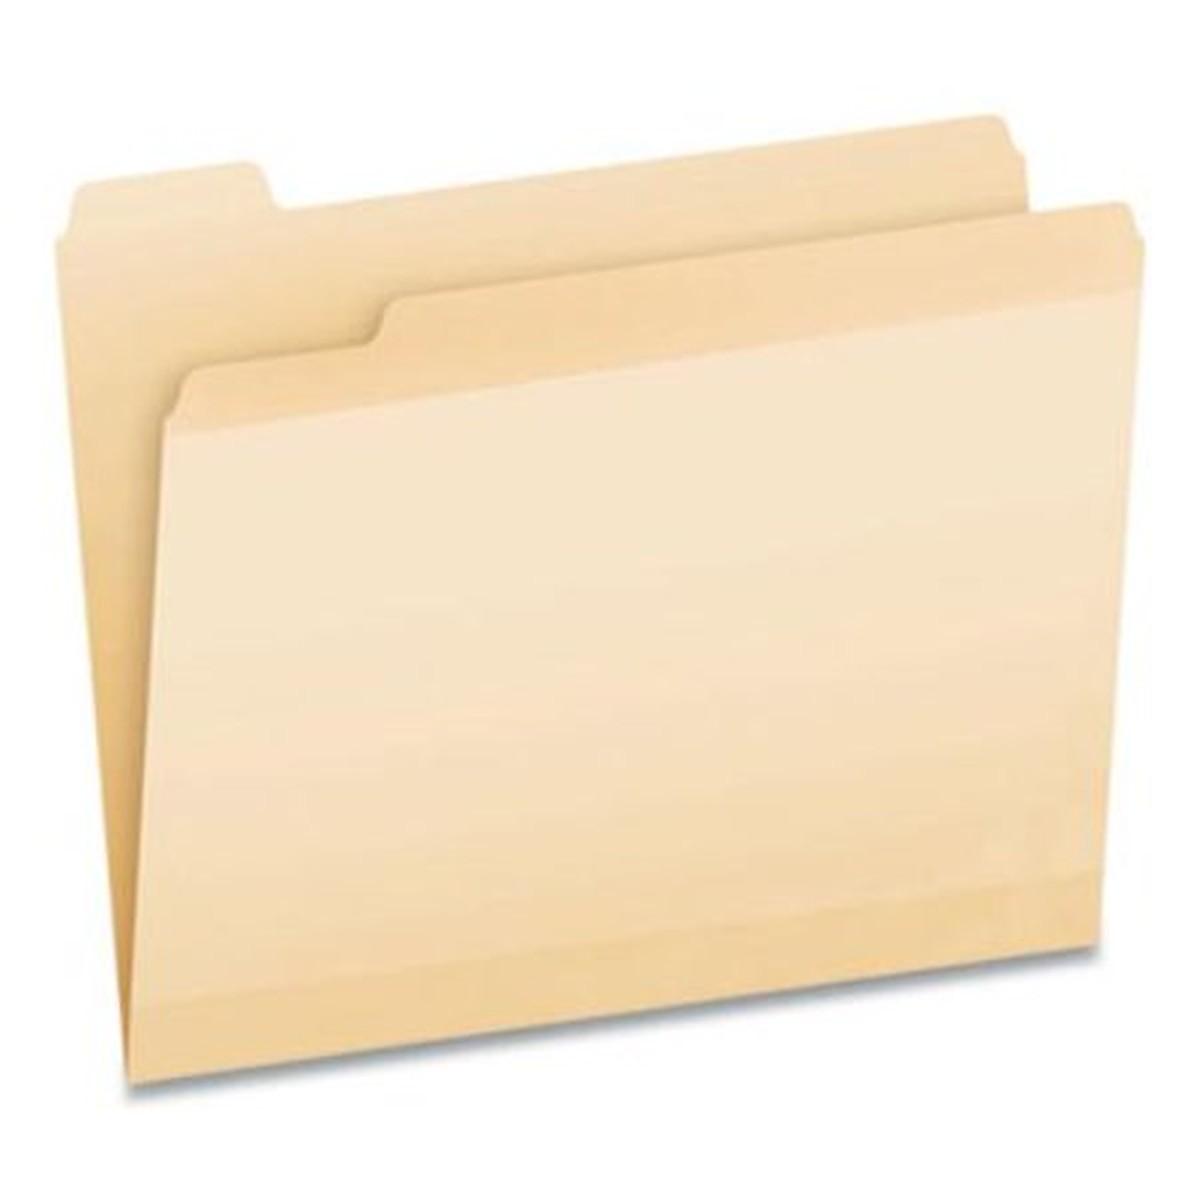 Poly Reinforced File Folder, 1/2-Cut Tabs, Letter Size, Manila, 24/Pack